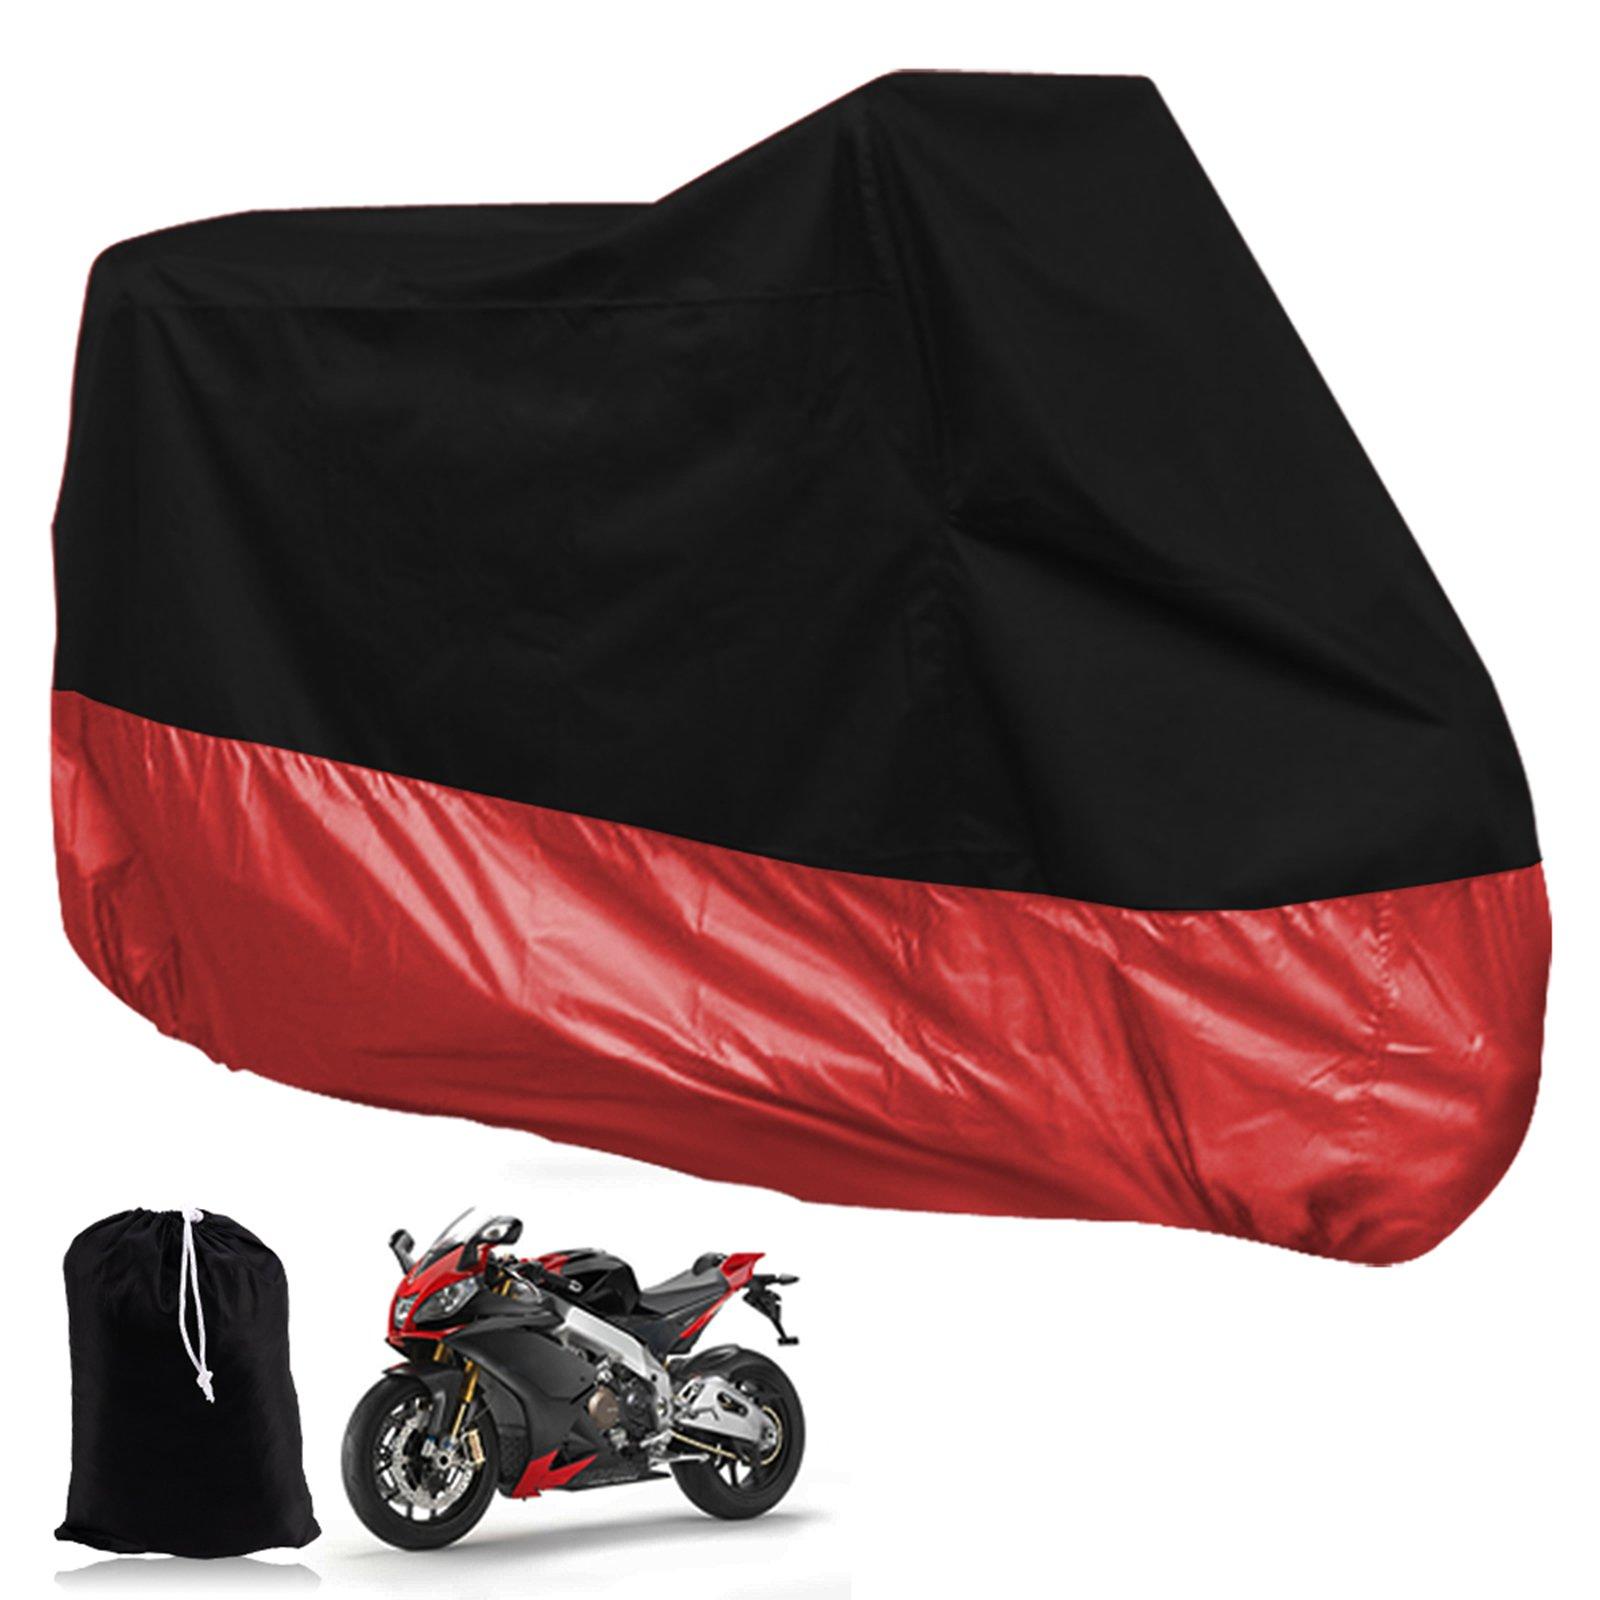 Funda de Asiento Funda Impermeable Coj/ín Transpirable Asiento Scooter Motocicleta Auto El/éctrico Rojo XL